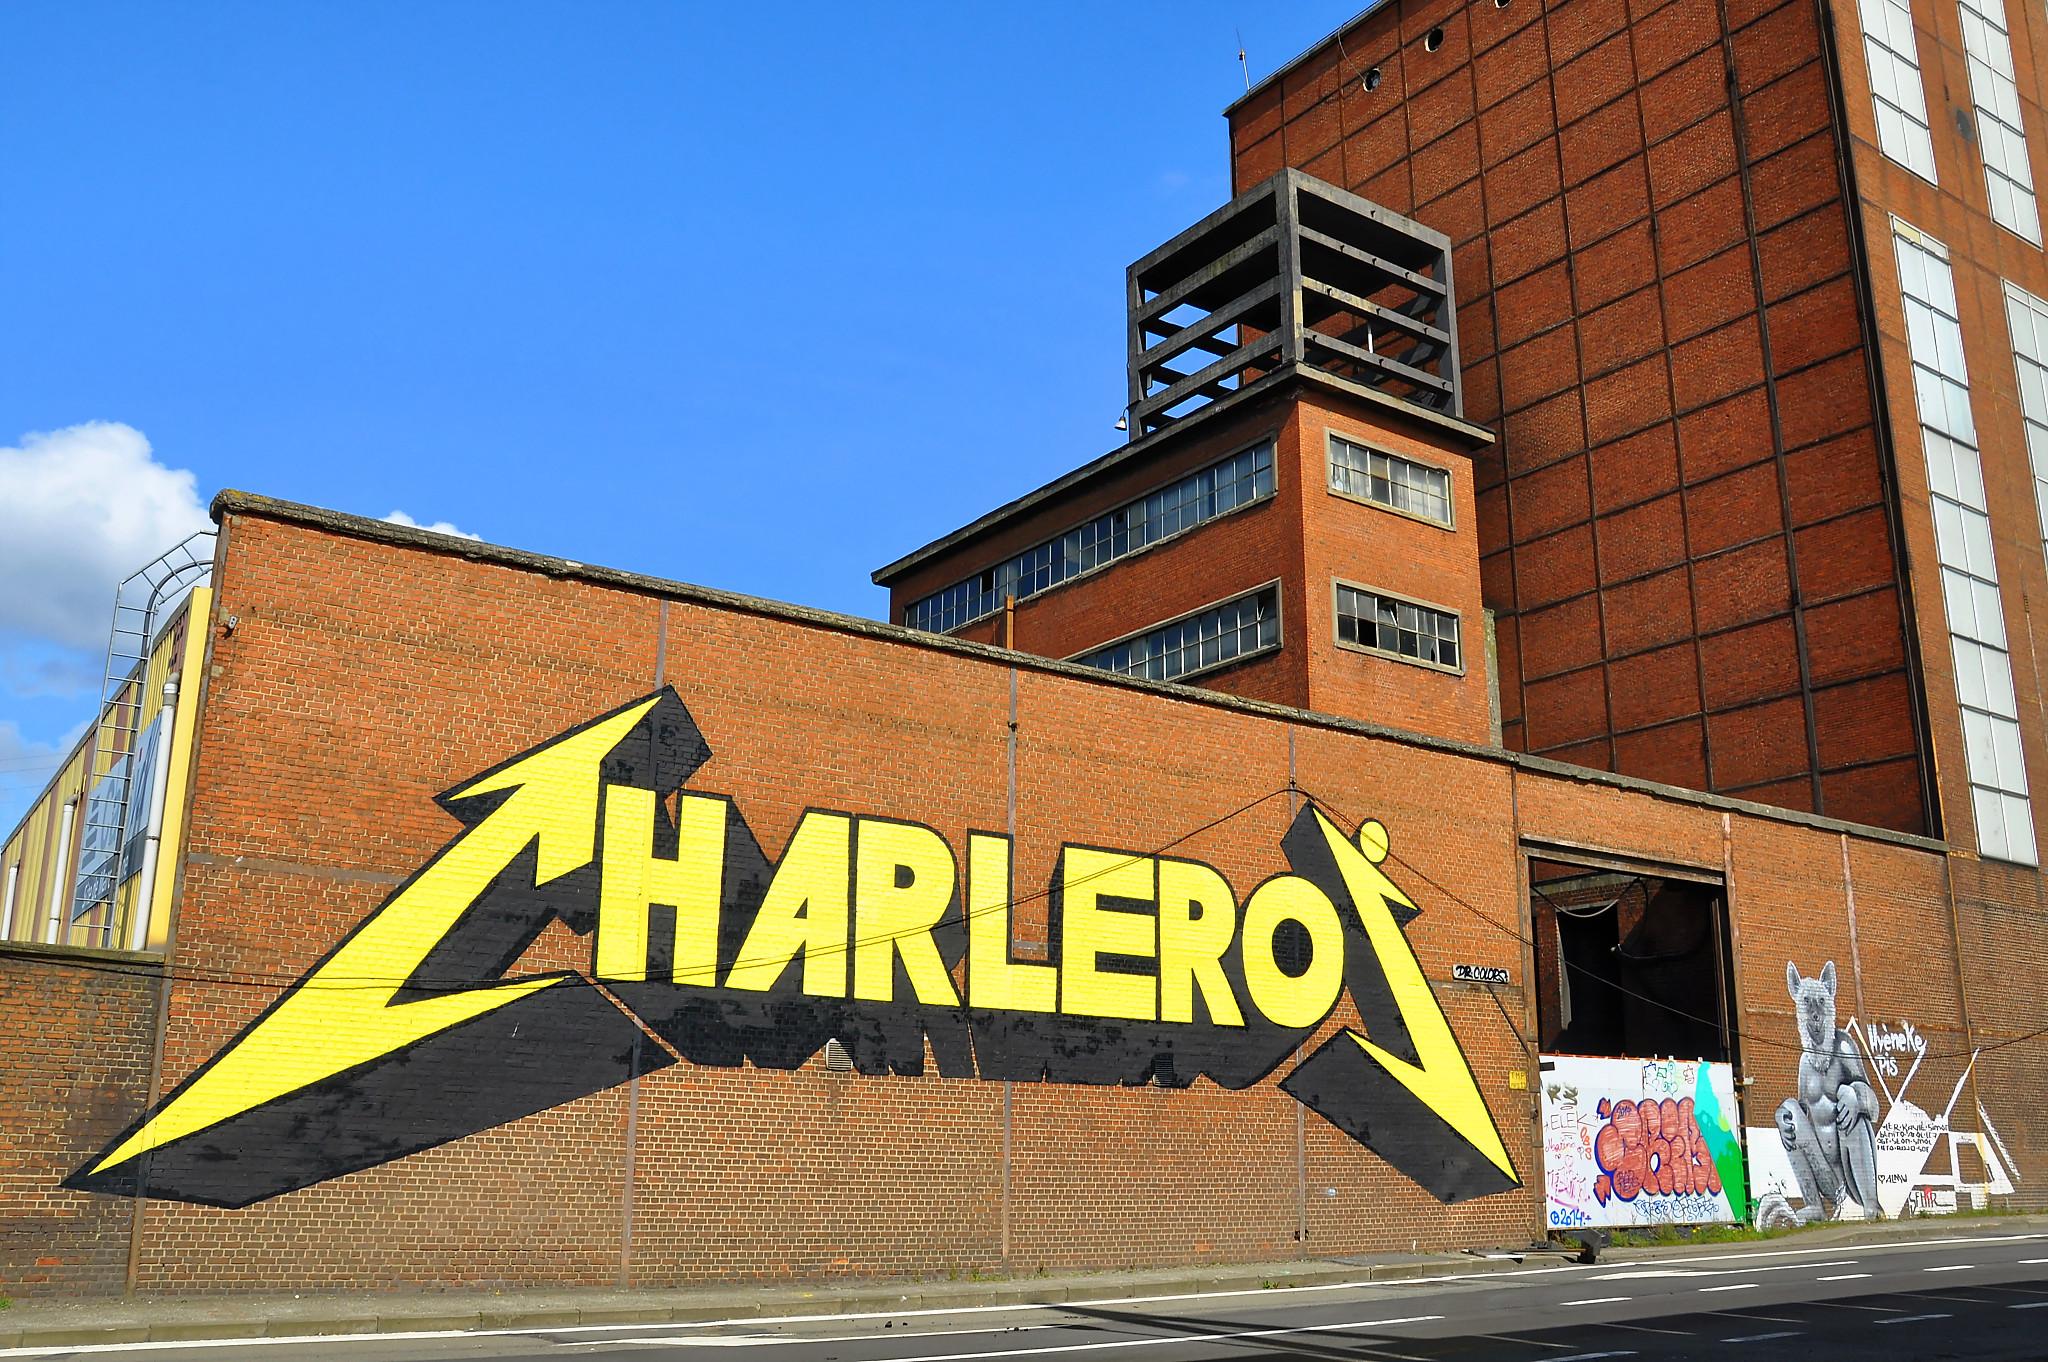 FW Discovery Box 12 - Charleroi